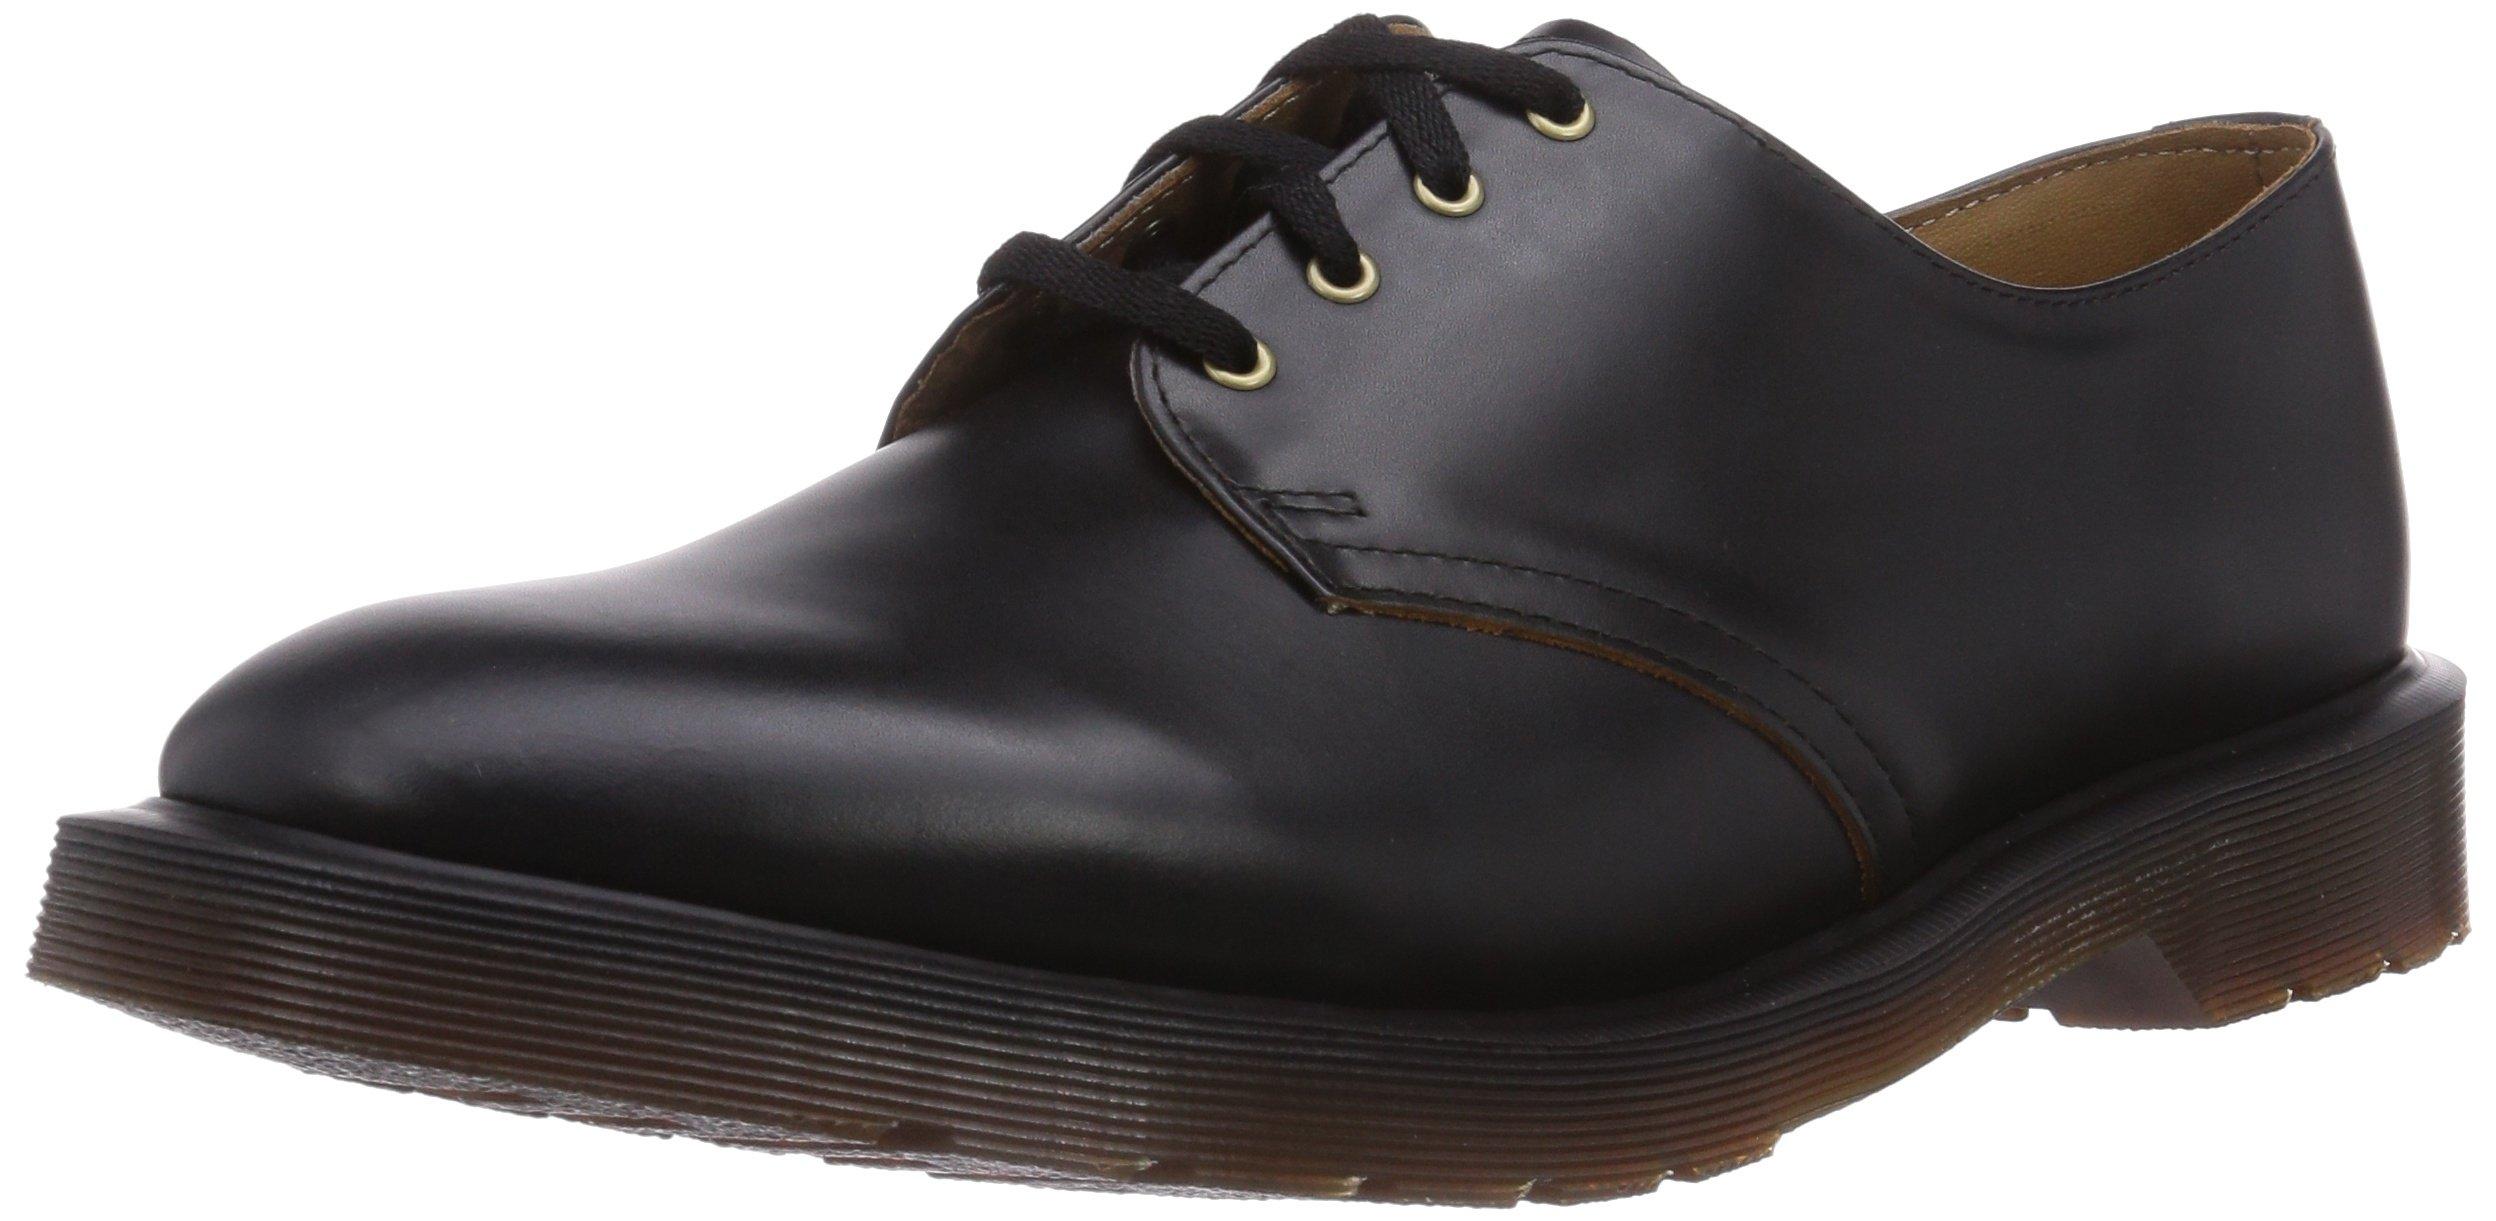 Dr. Martens Men's Smiths 4 Eye Shoe